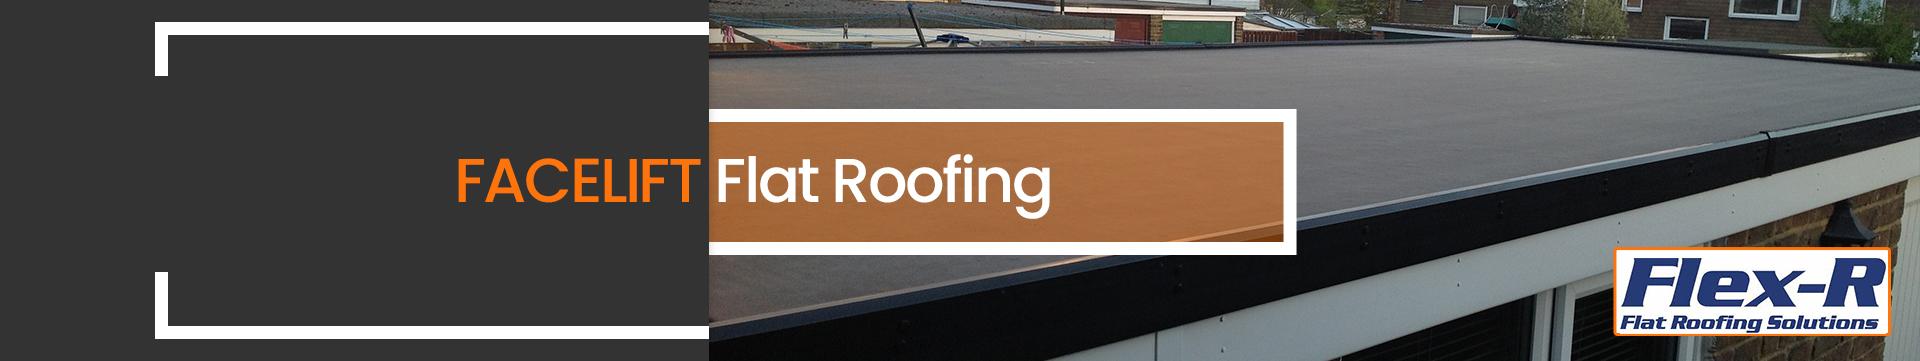 Facelift Flat Roof Banner